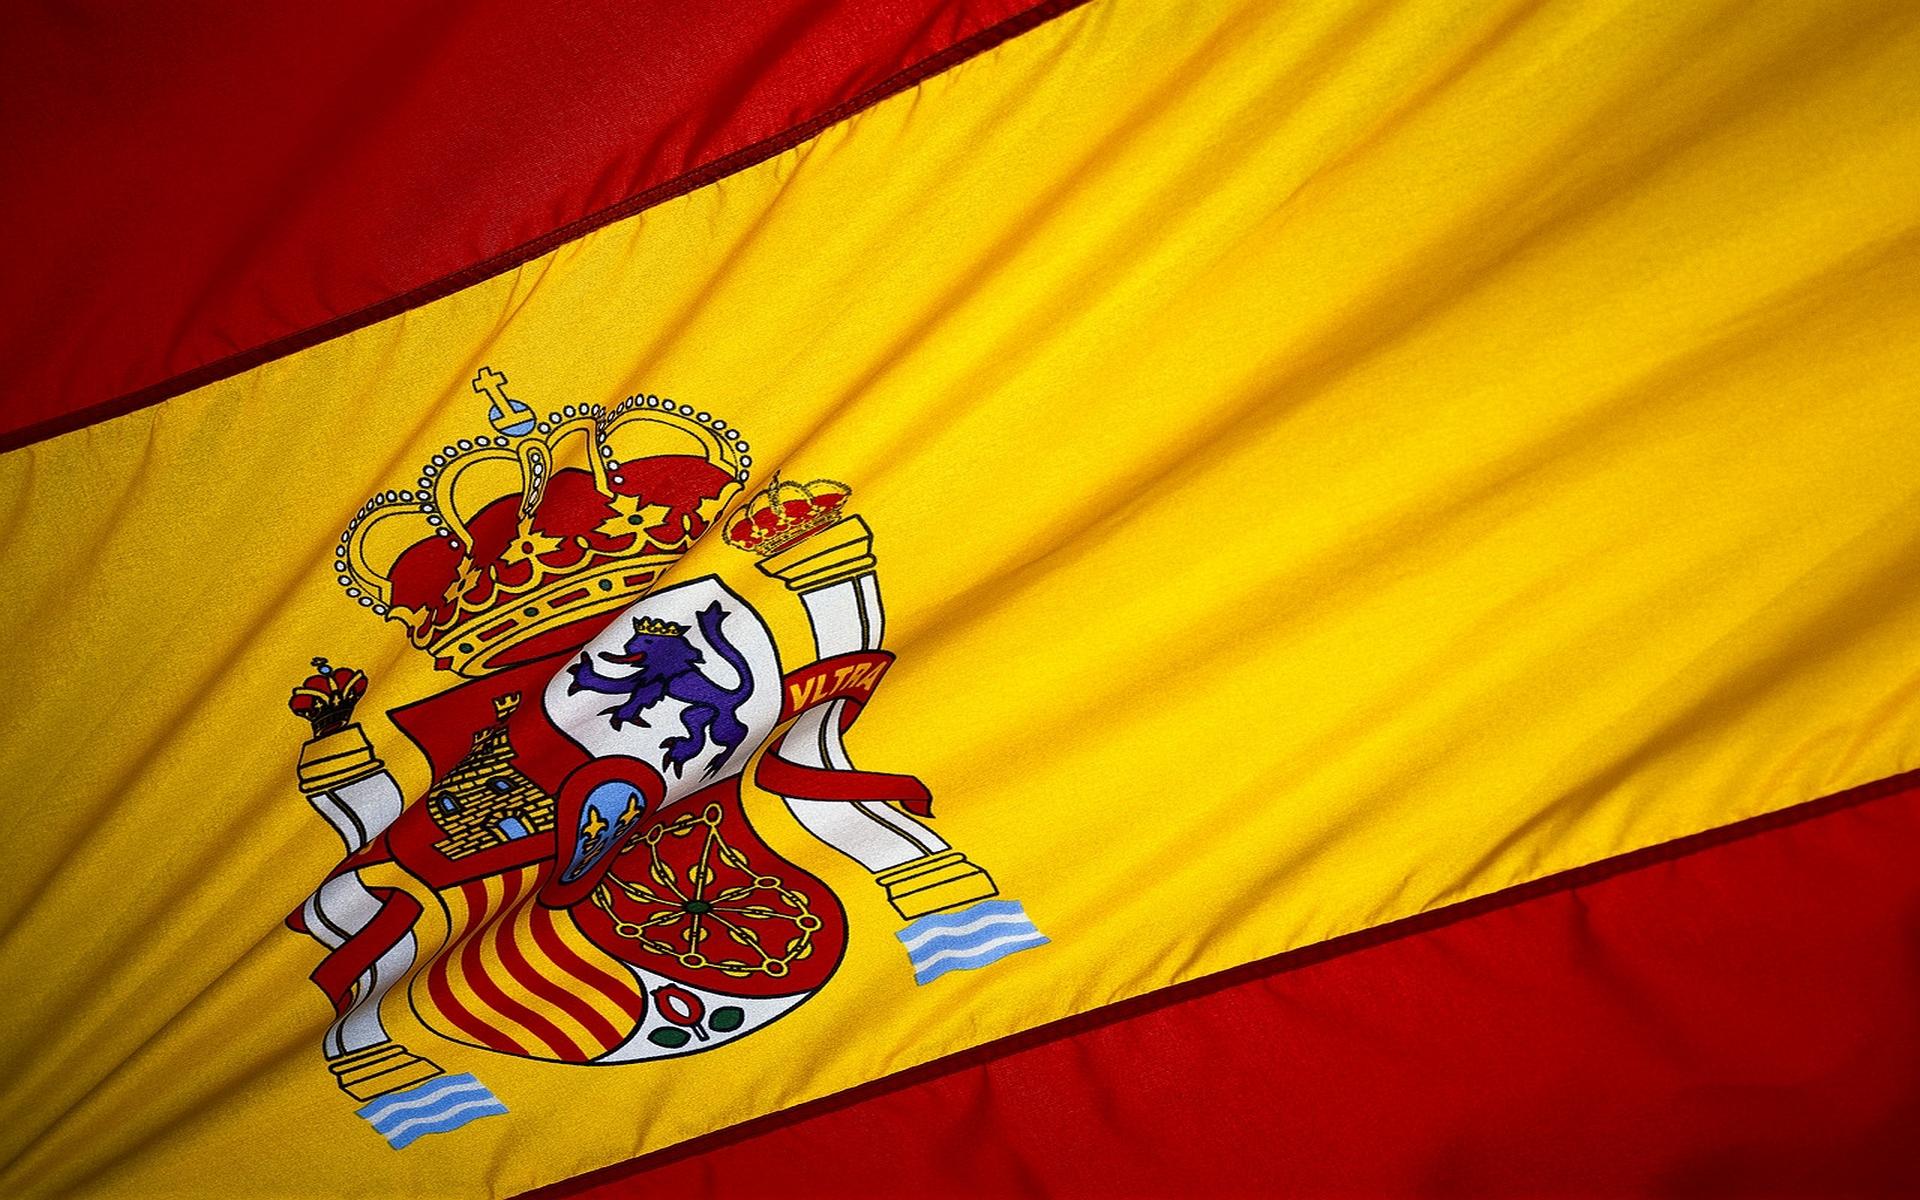 смерти испанский флаг фото в хорошем качестве ритуал